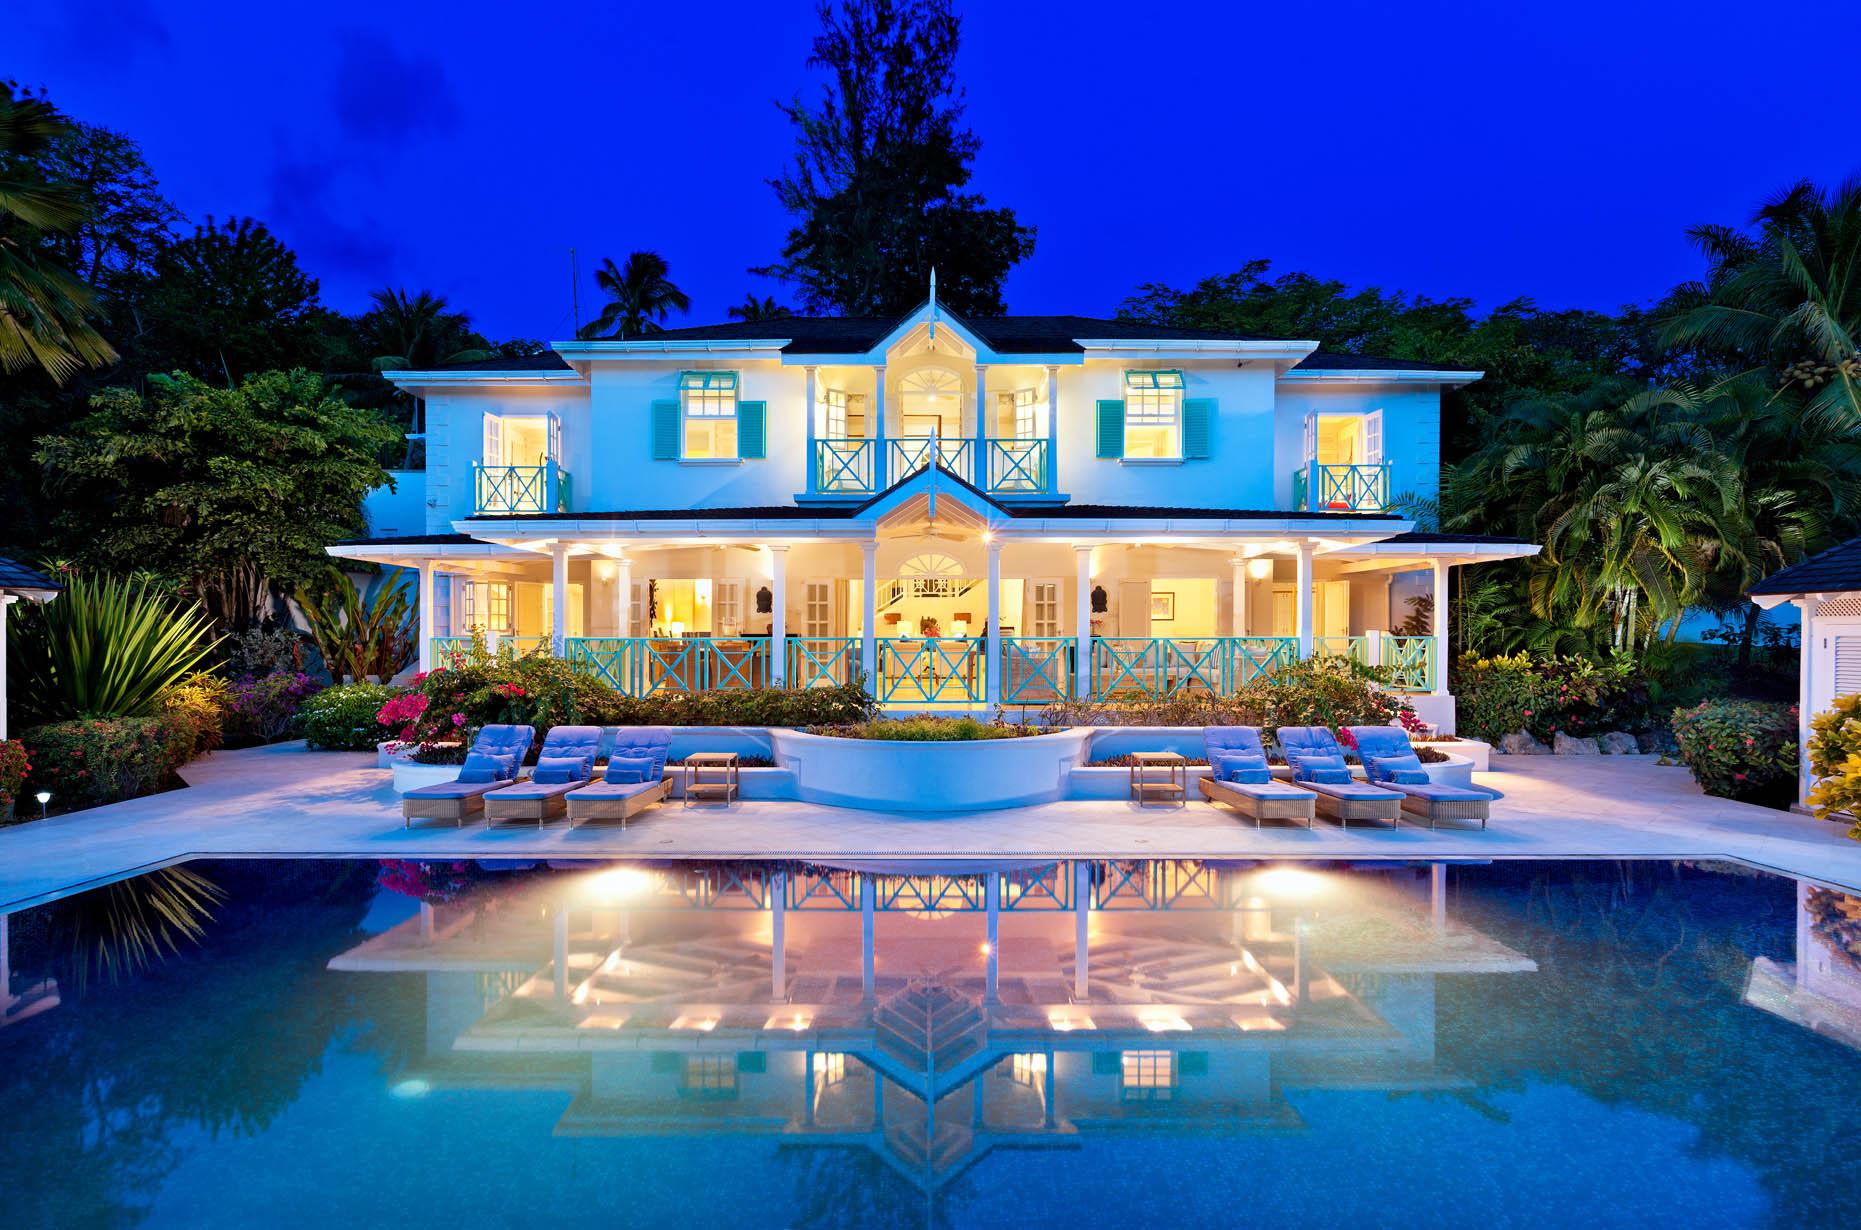 Moondance Villa Barbados First Hampton International Realty